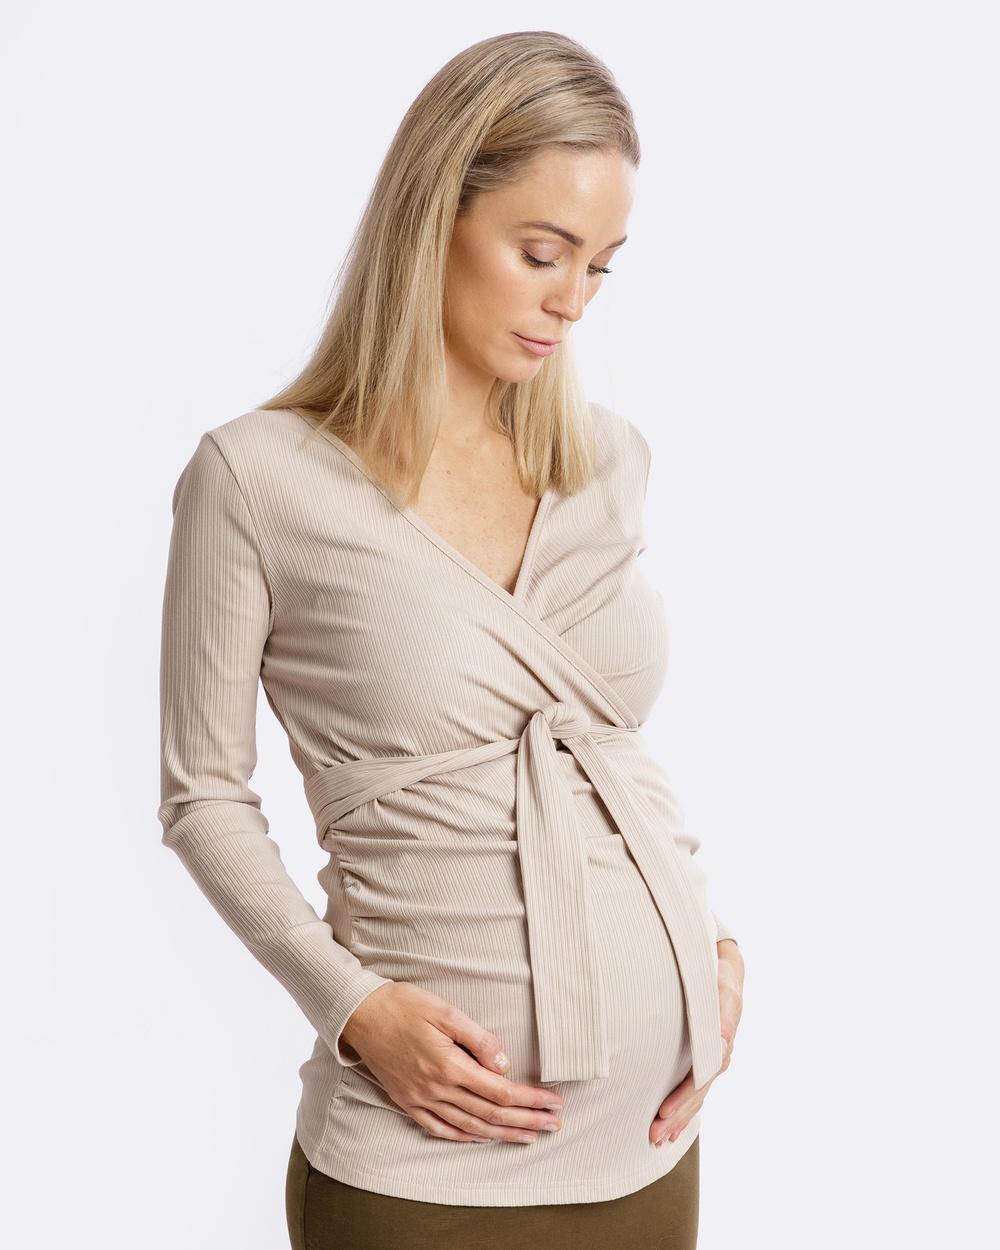 Maive & Bo Cara Maternity Top Tops Cream Cara Maternity Top